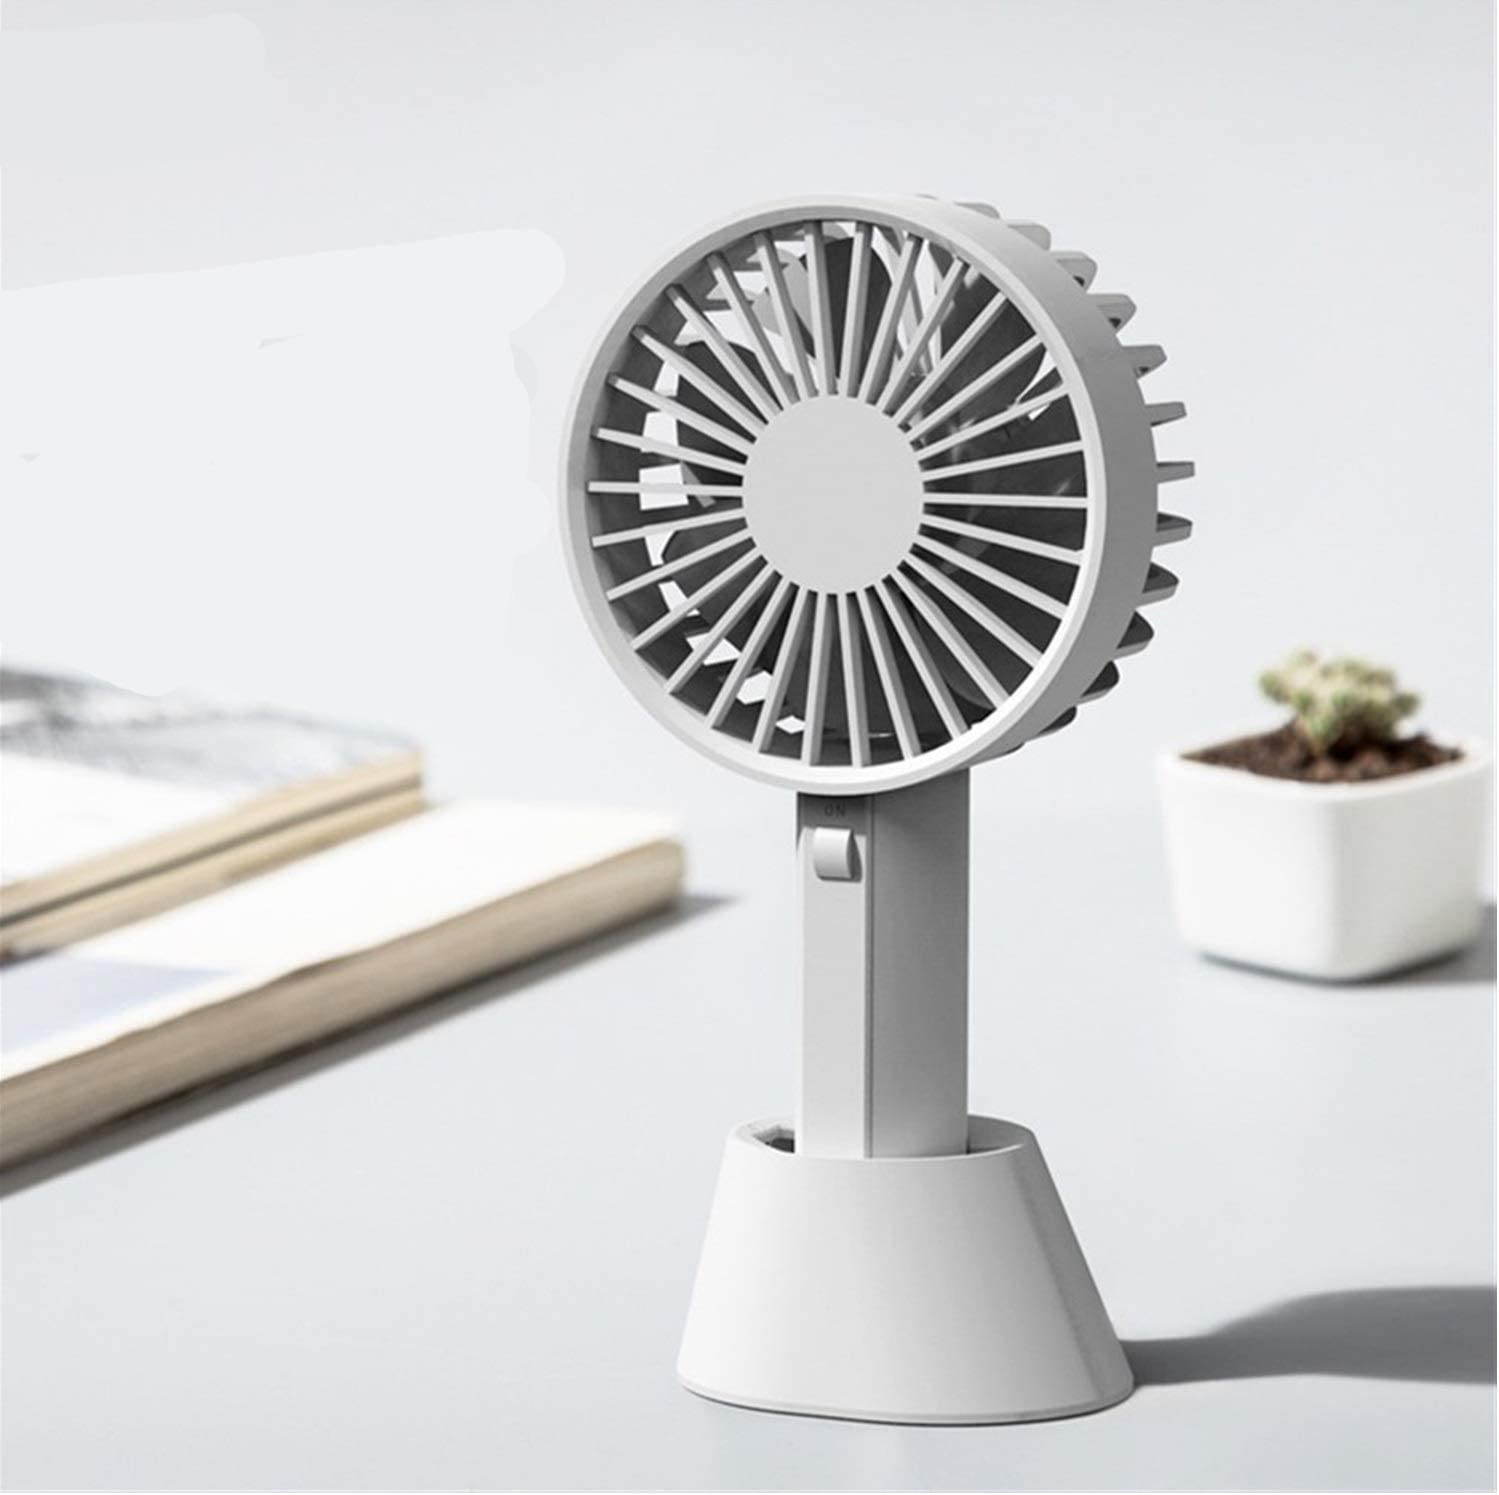 HAOXIONG-ZHANG Portable Handheld Fan Miniskirt Rechargeable Mute USB Table Fan Portable 7 Leaf Little Electric Fan Electric Fan Color : Grey